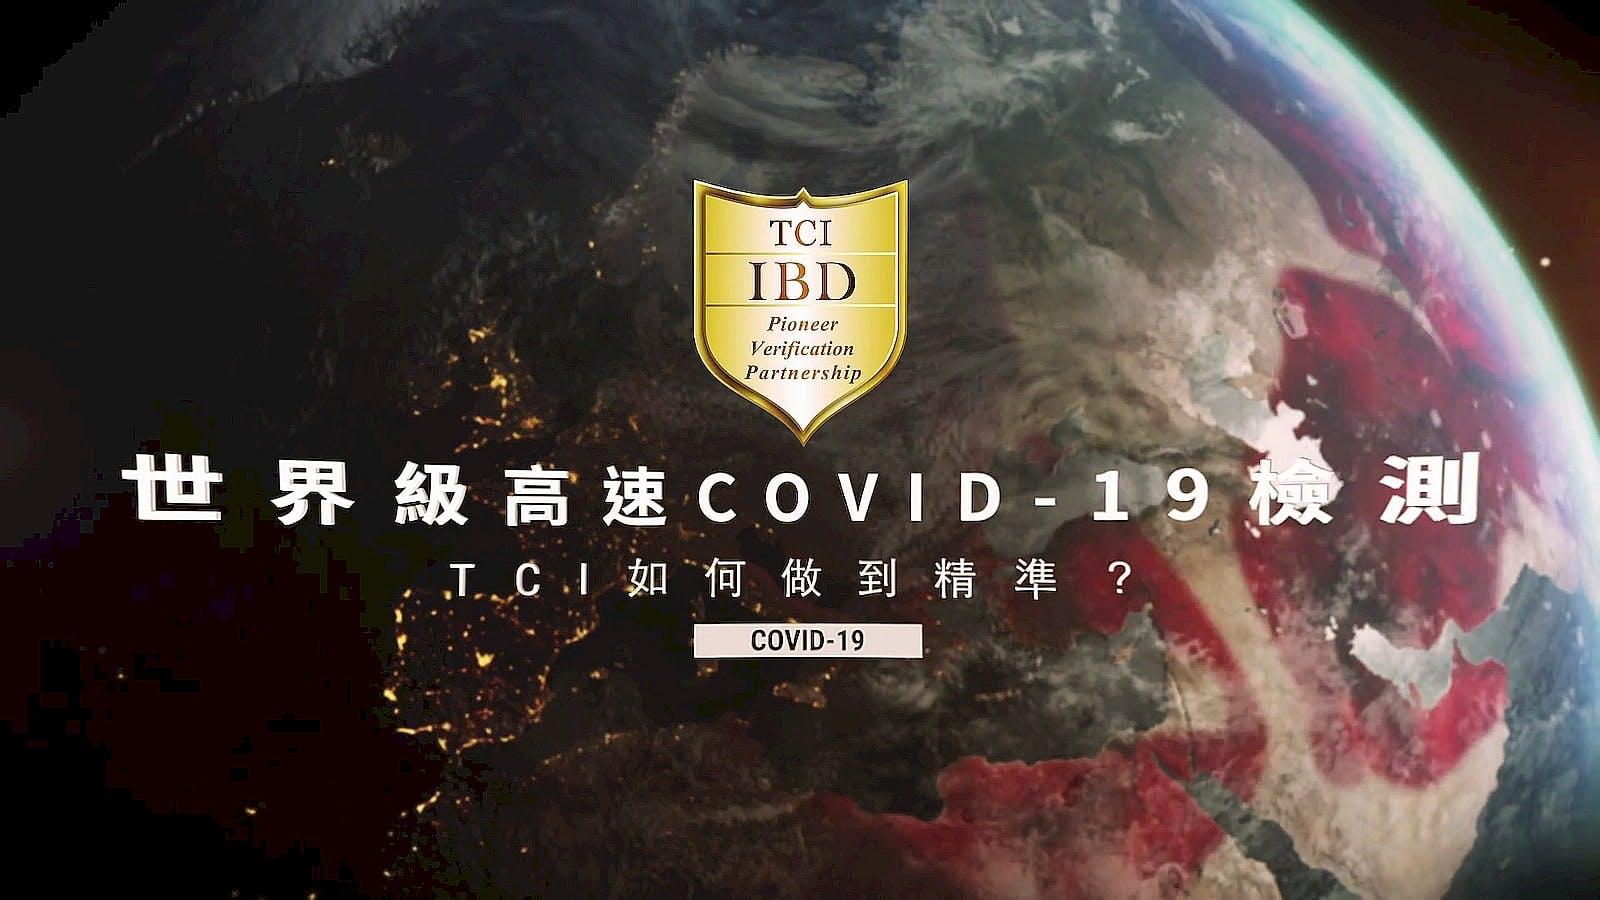 TCI 大江生醫如何做到既「快速」又「精確」的新冠肺炎檢測?